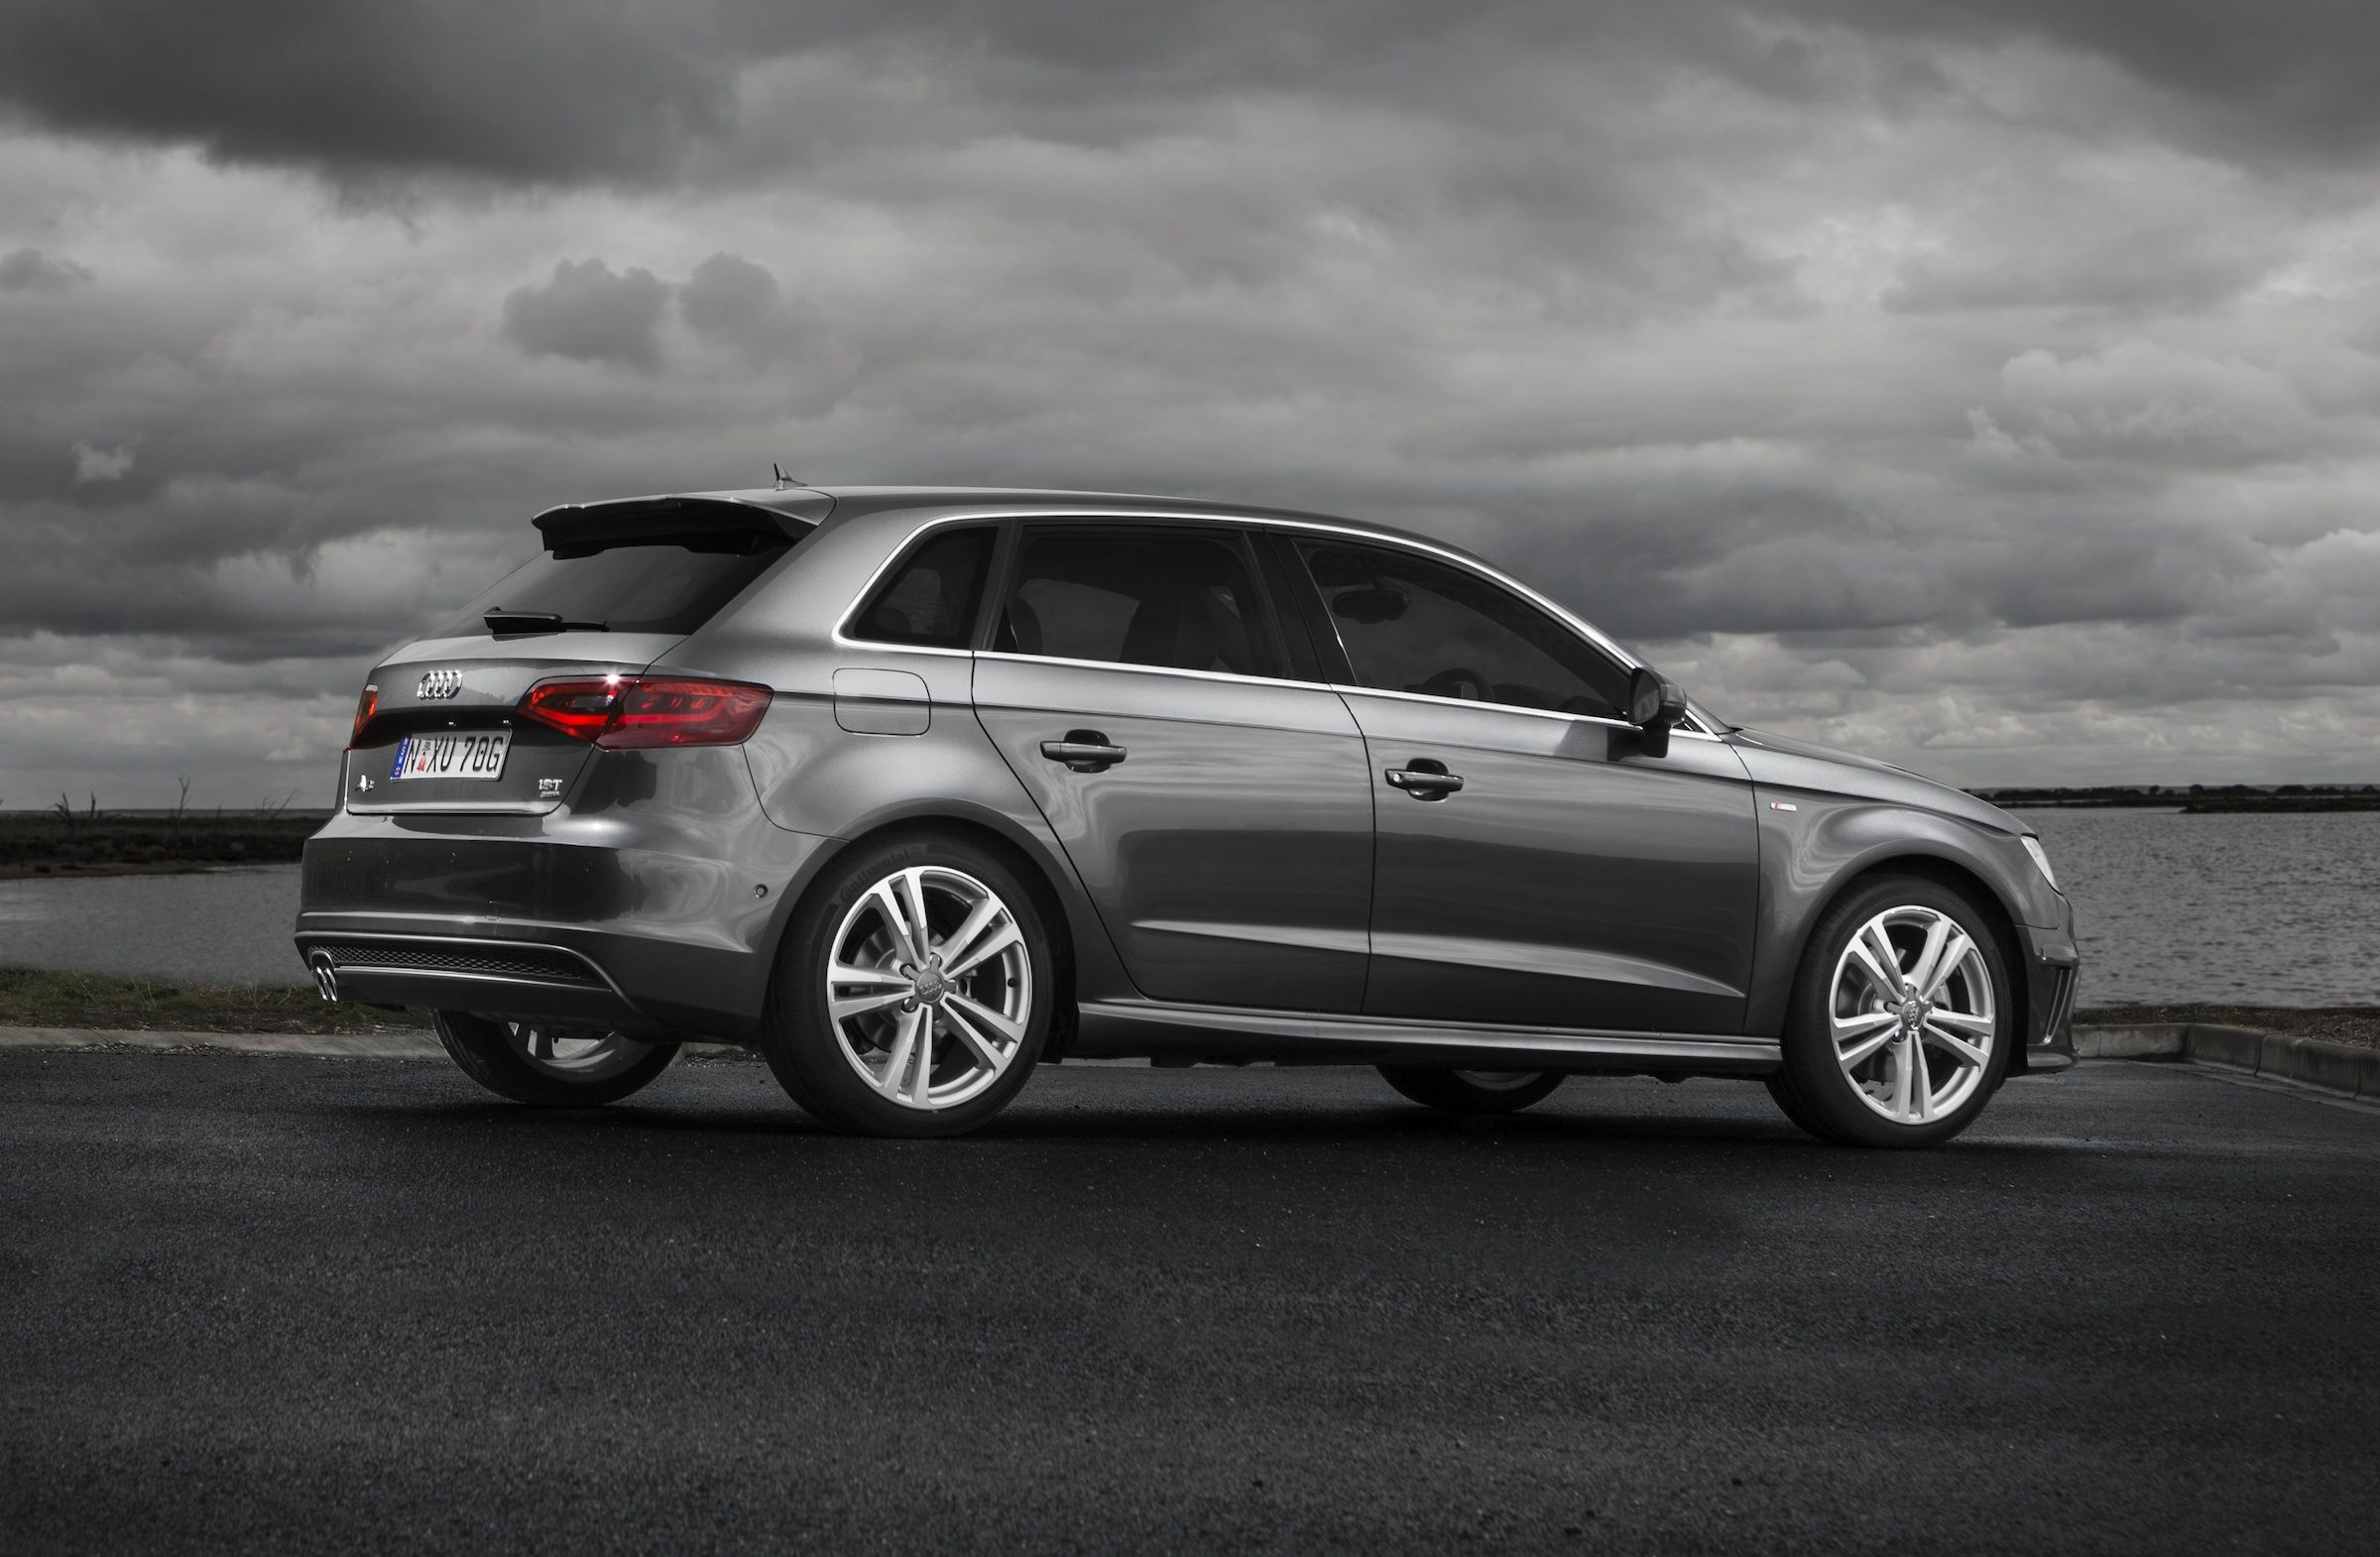 Audi A3 Review 1 8 Tfsi Quattro